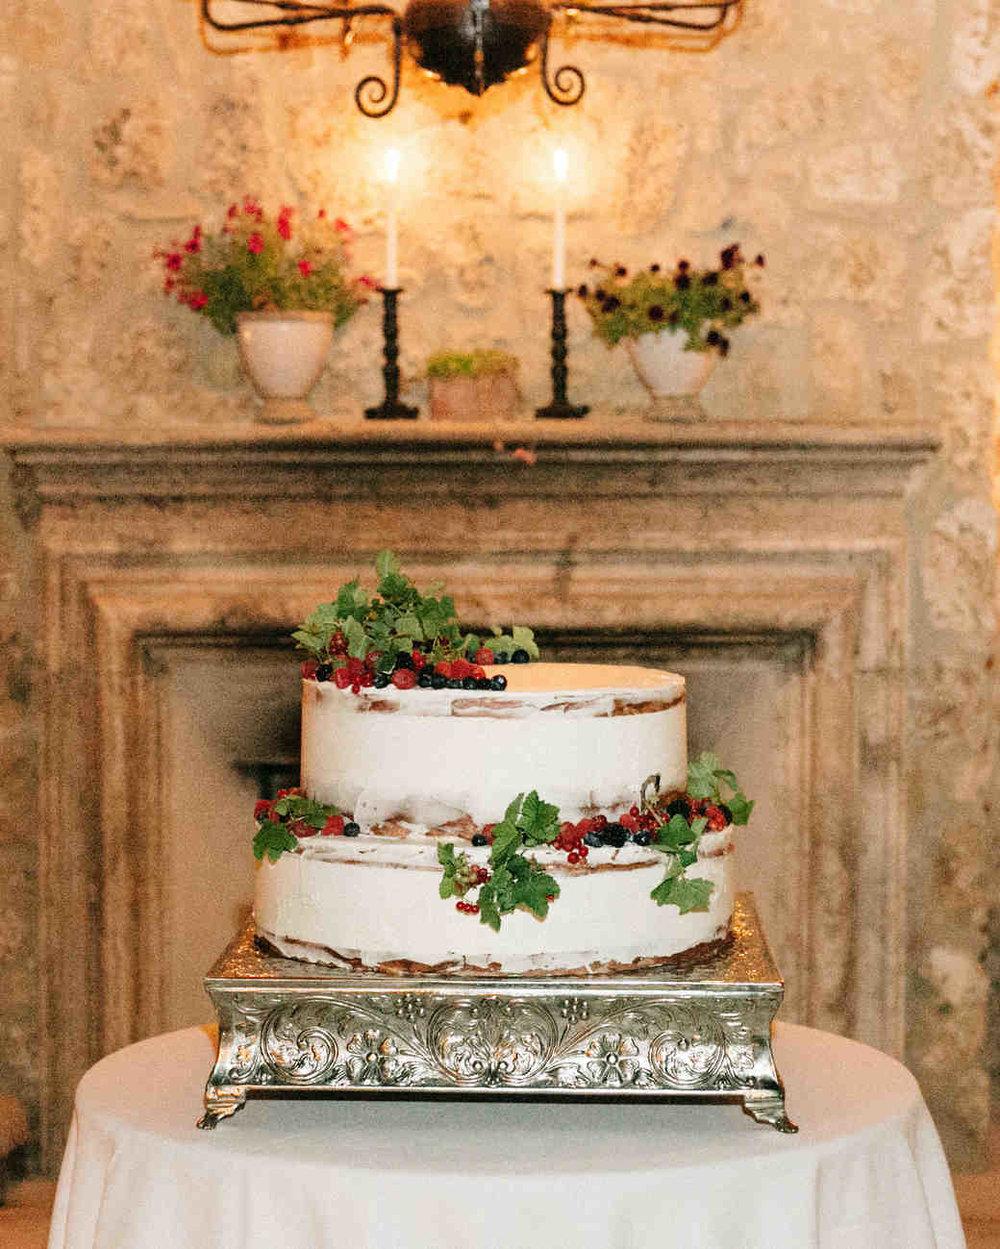 alexis-zach-wedding-italy-cake-438-6419608-1117_vert.jpg